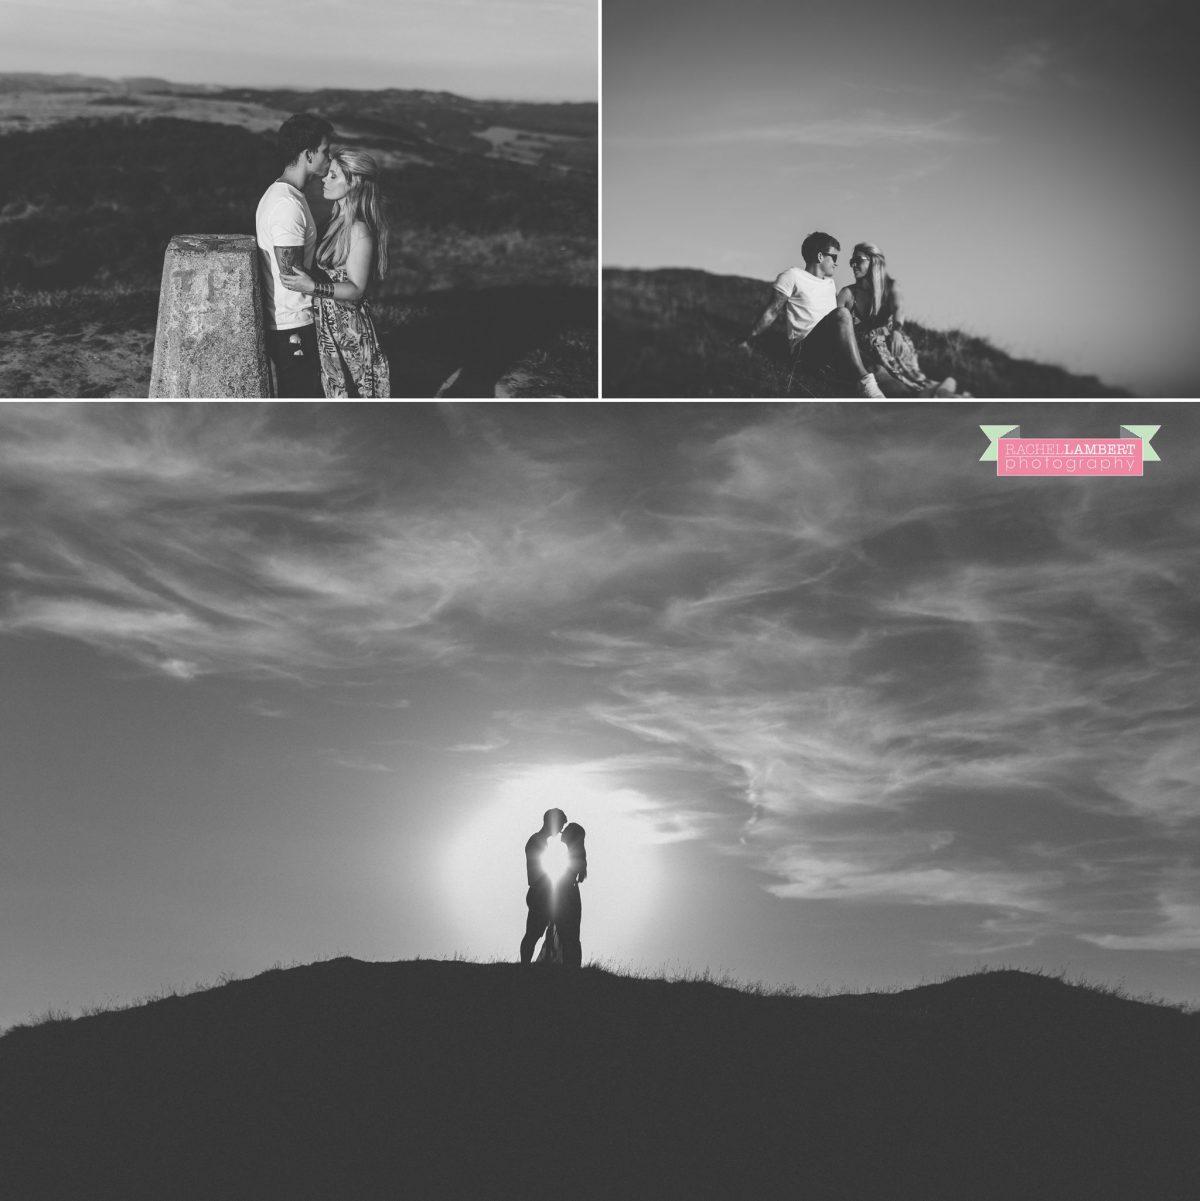 welsh_wedding_photographer_decourceys_rachel_lambert_photography_ceri_chris_engagement_shoot_garth_mountain_ 6